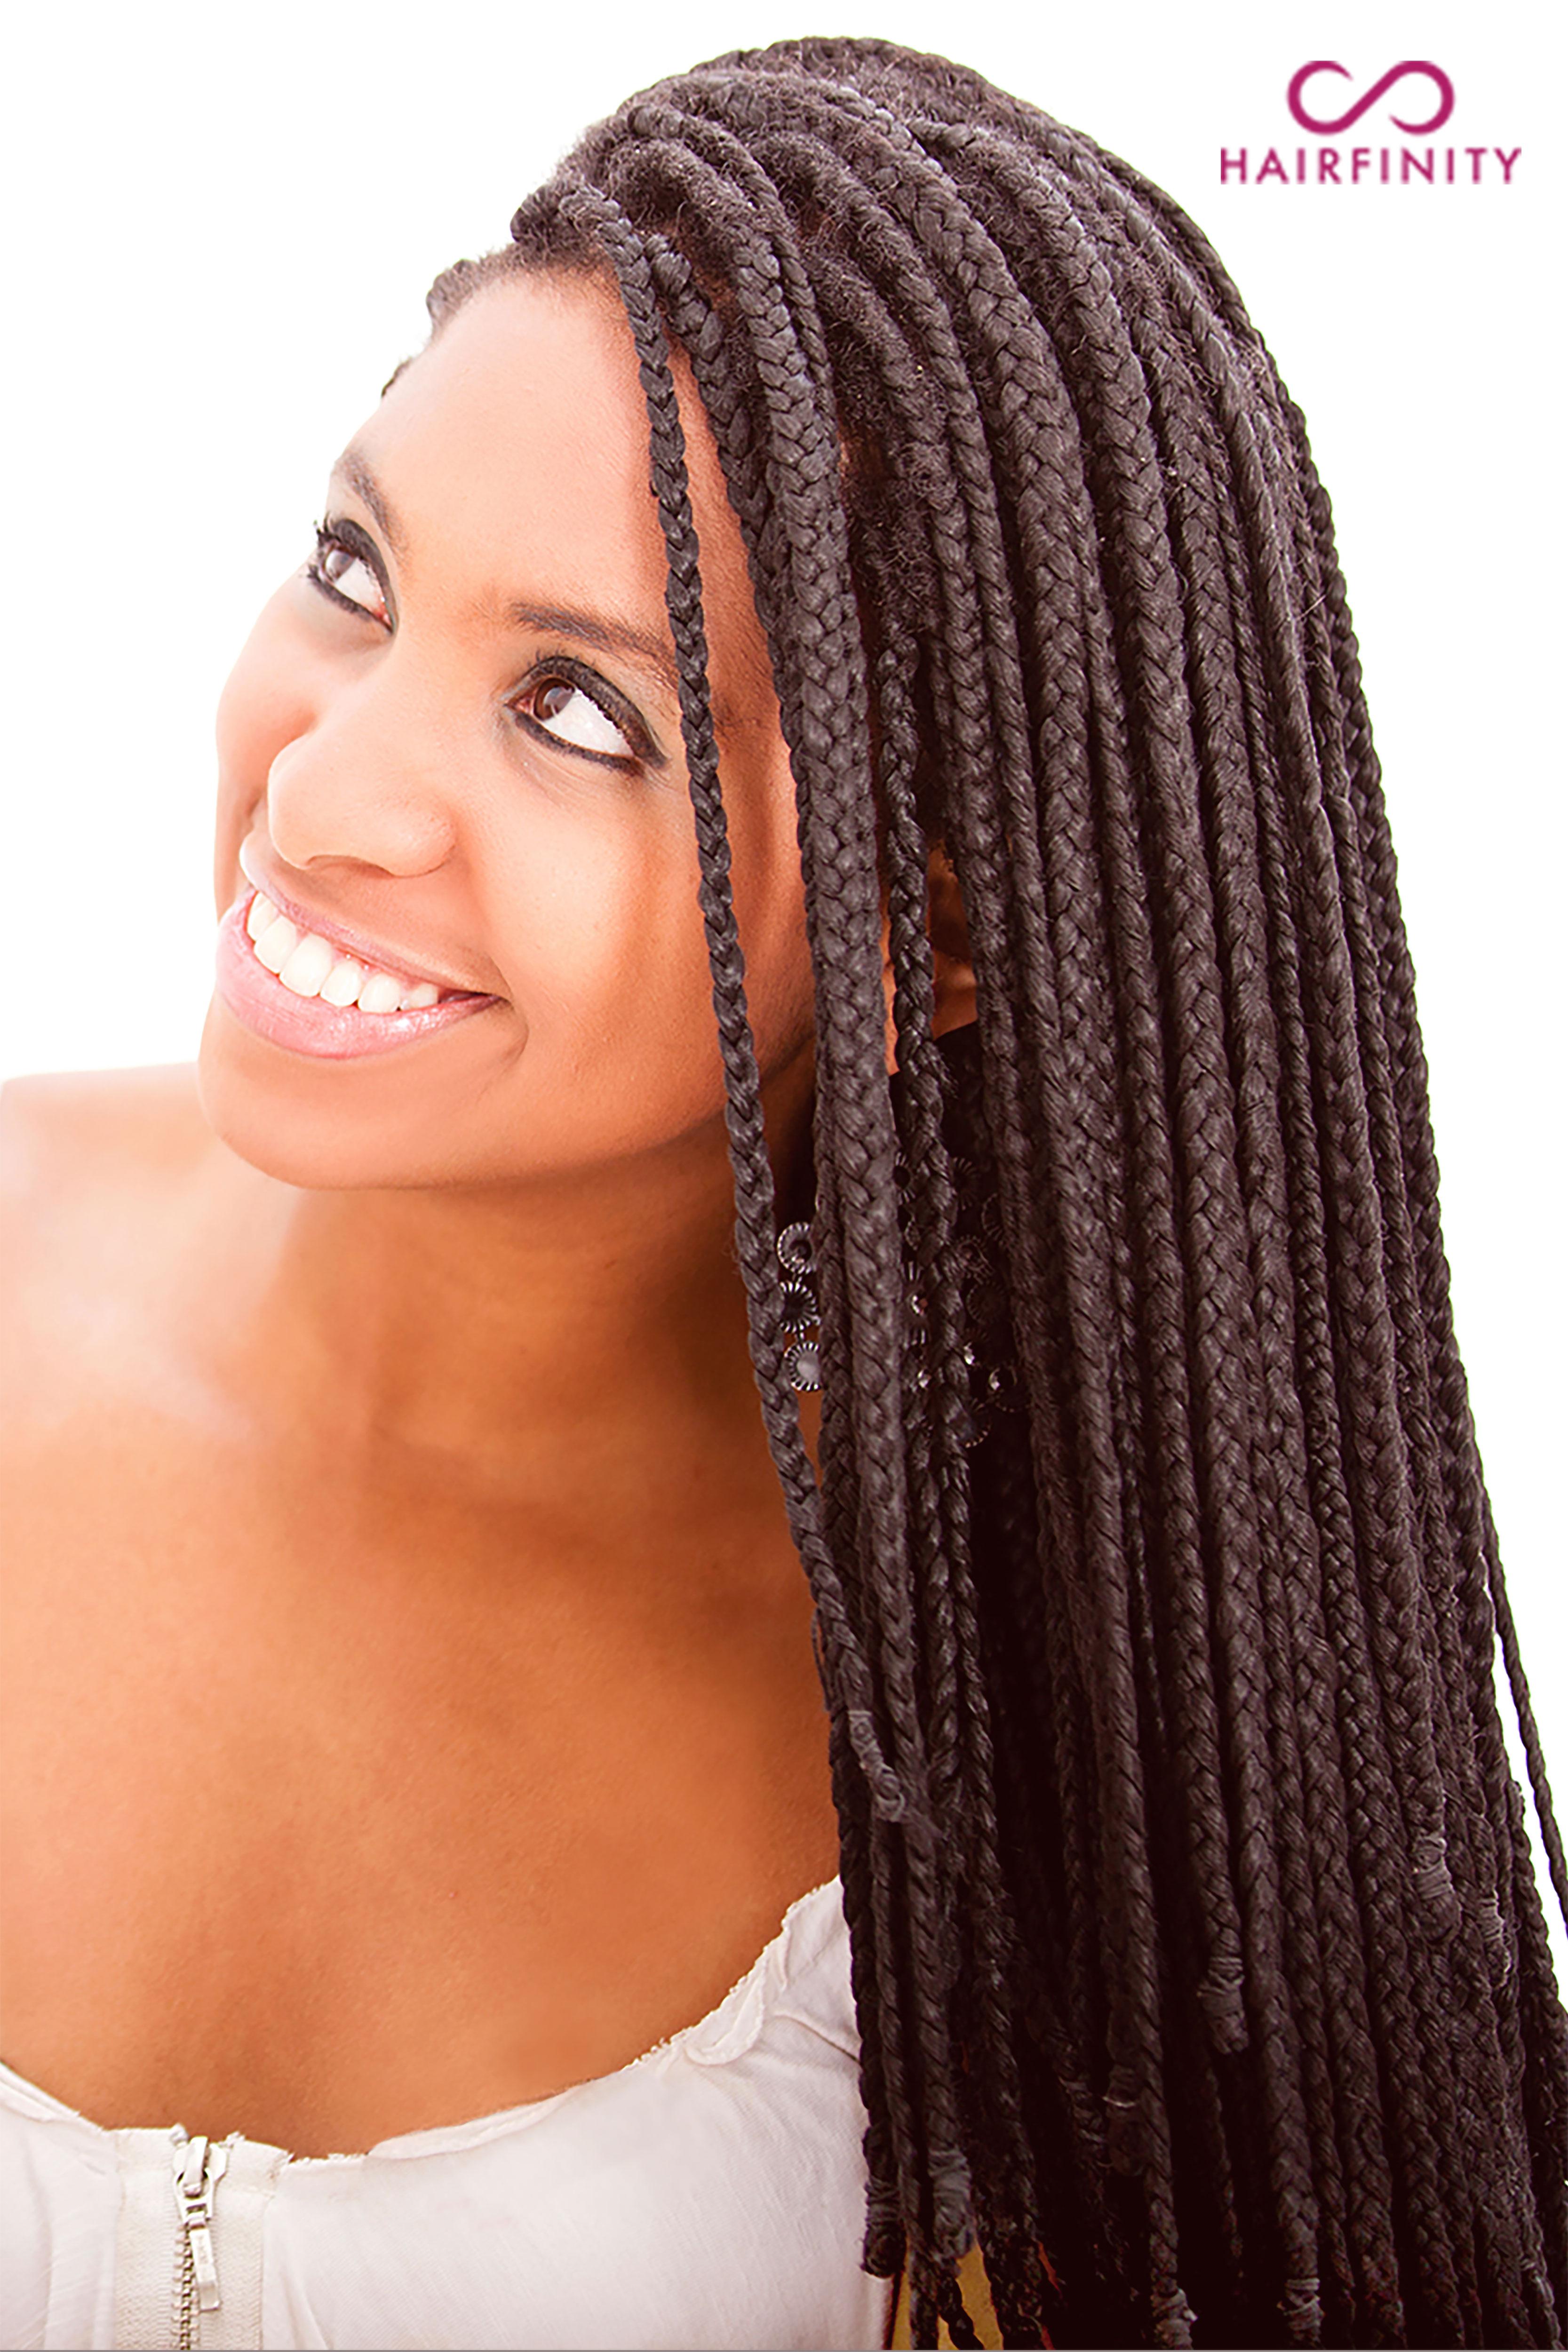 Hairfinity United States Blog Protective Styles Harm